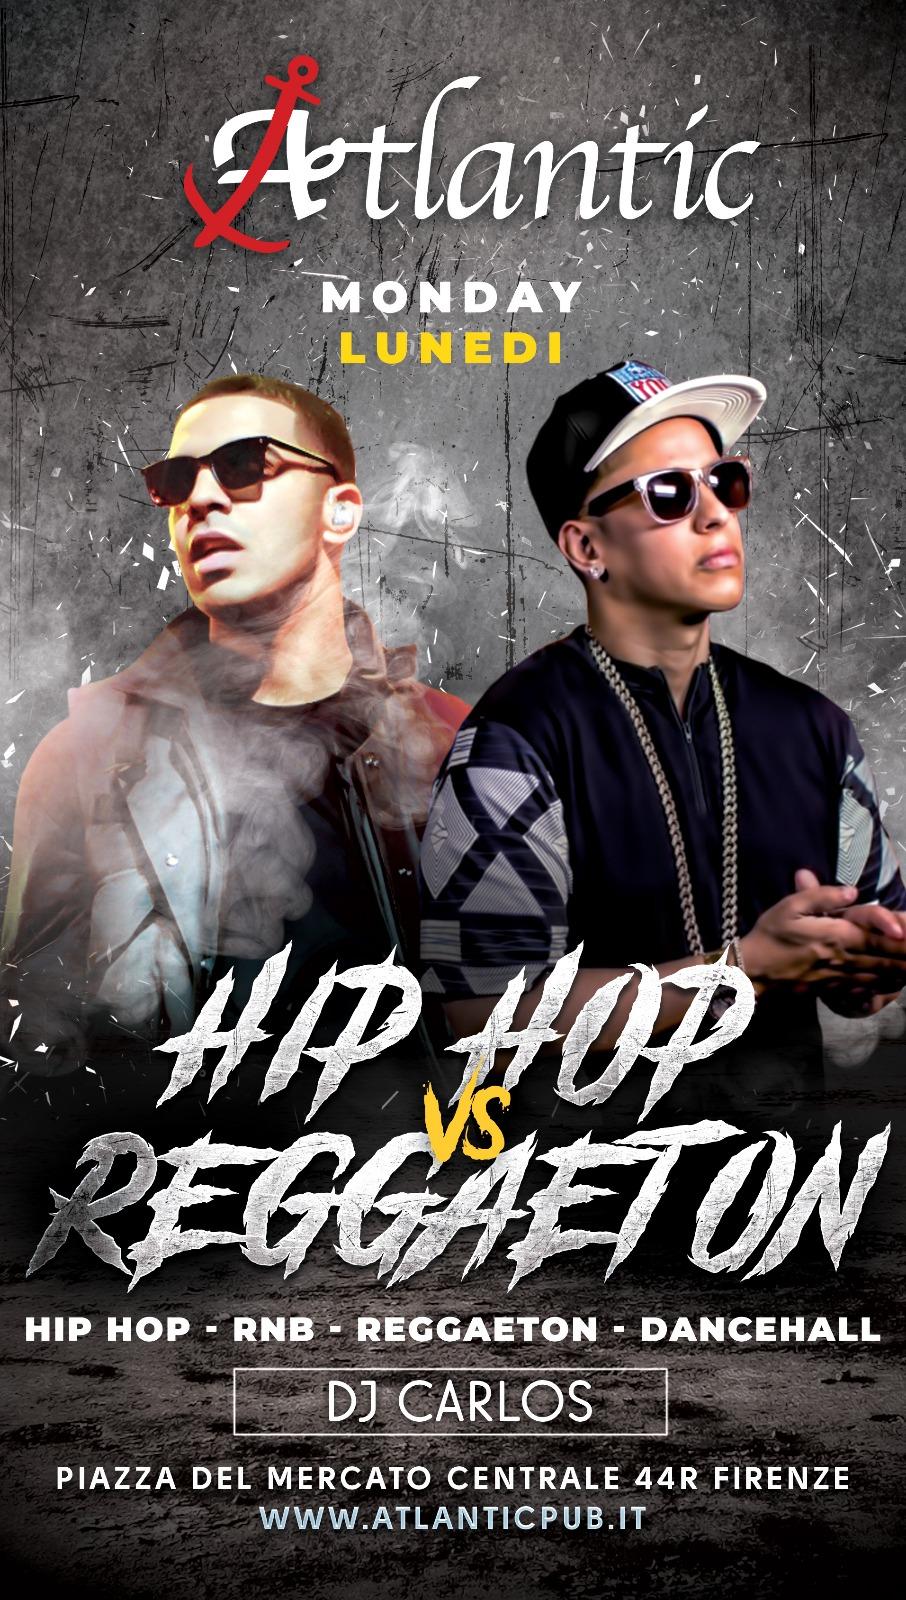 hiphop reggaeton dancehall Firenze lunedì